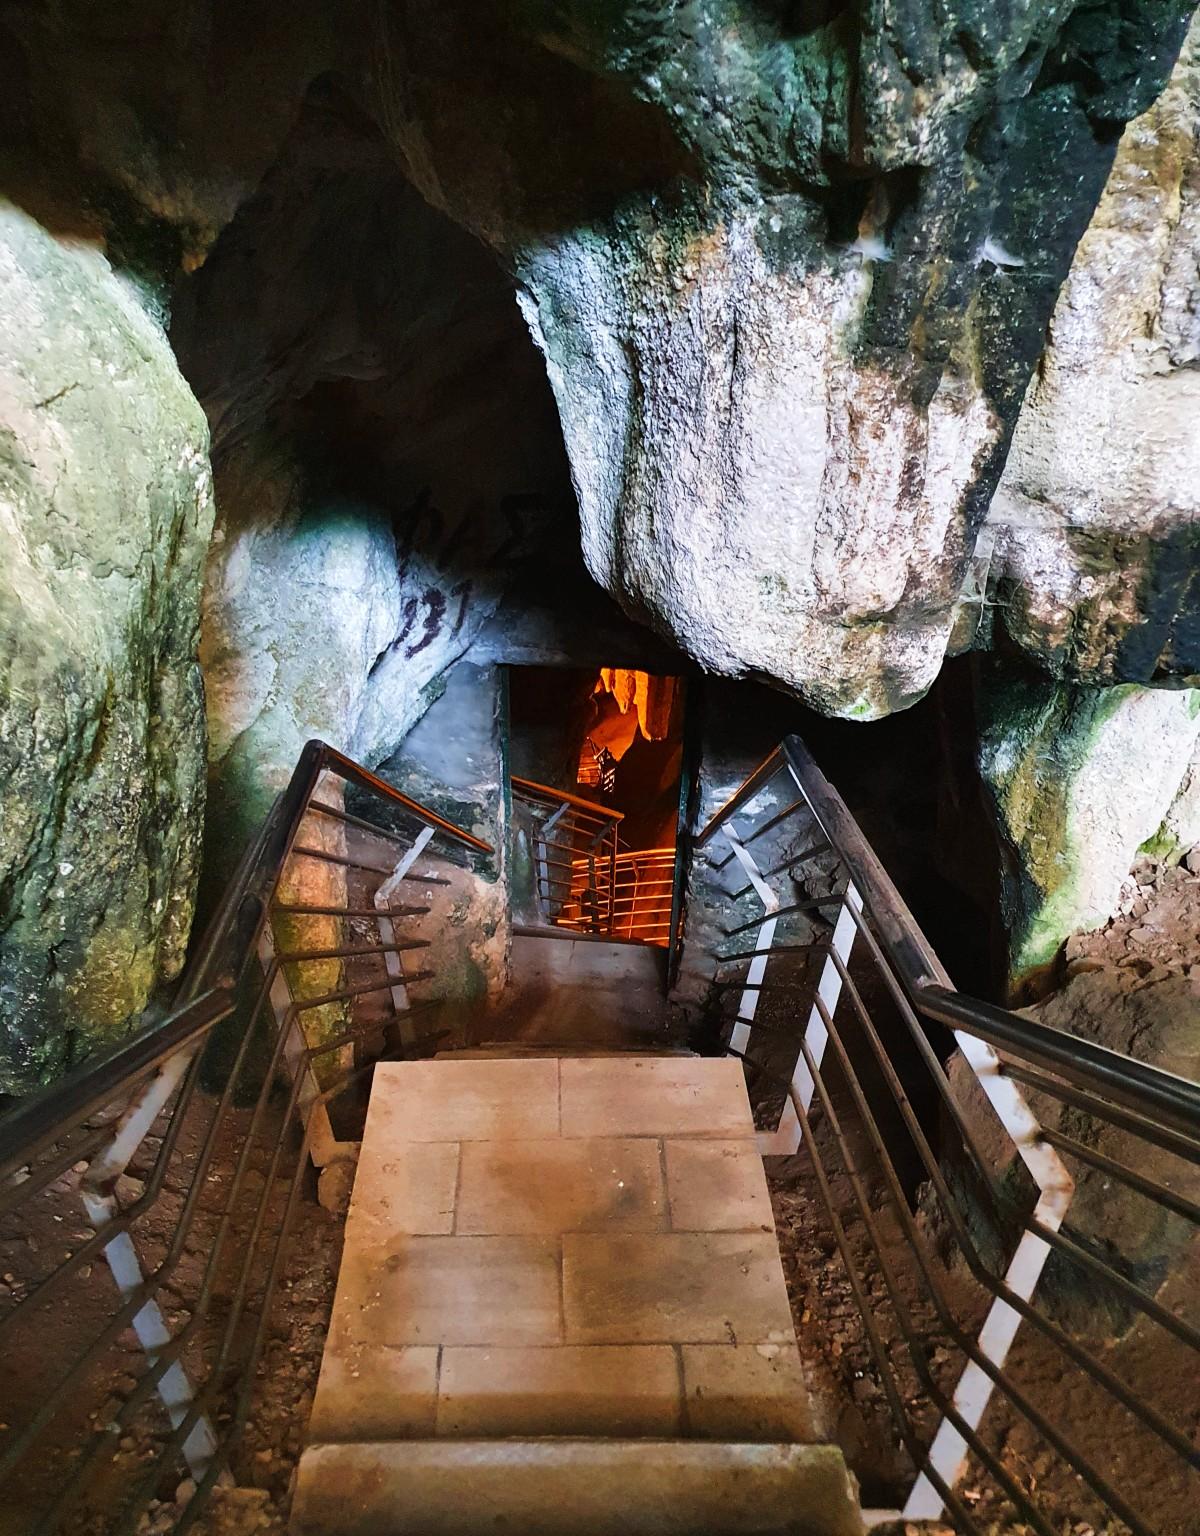 Antiparos Cave can be explored through a staircase